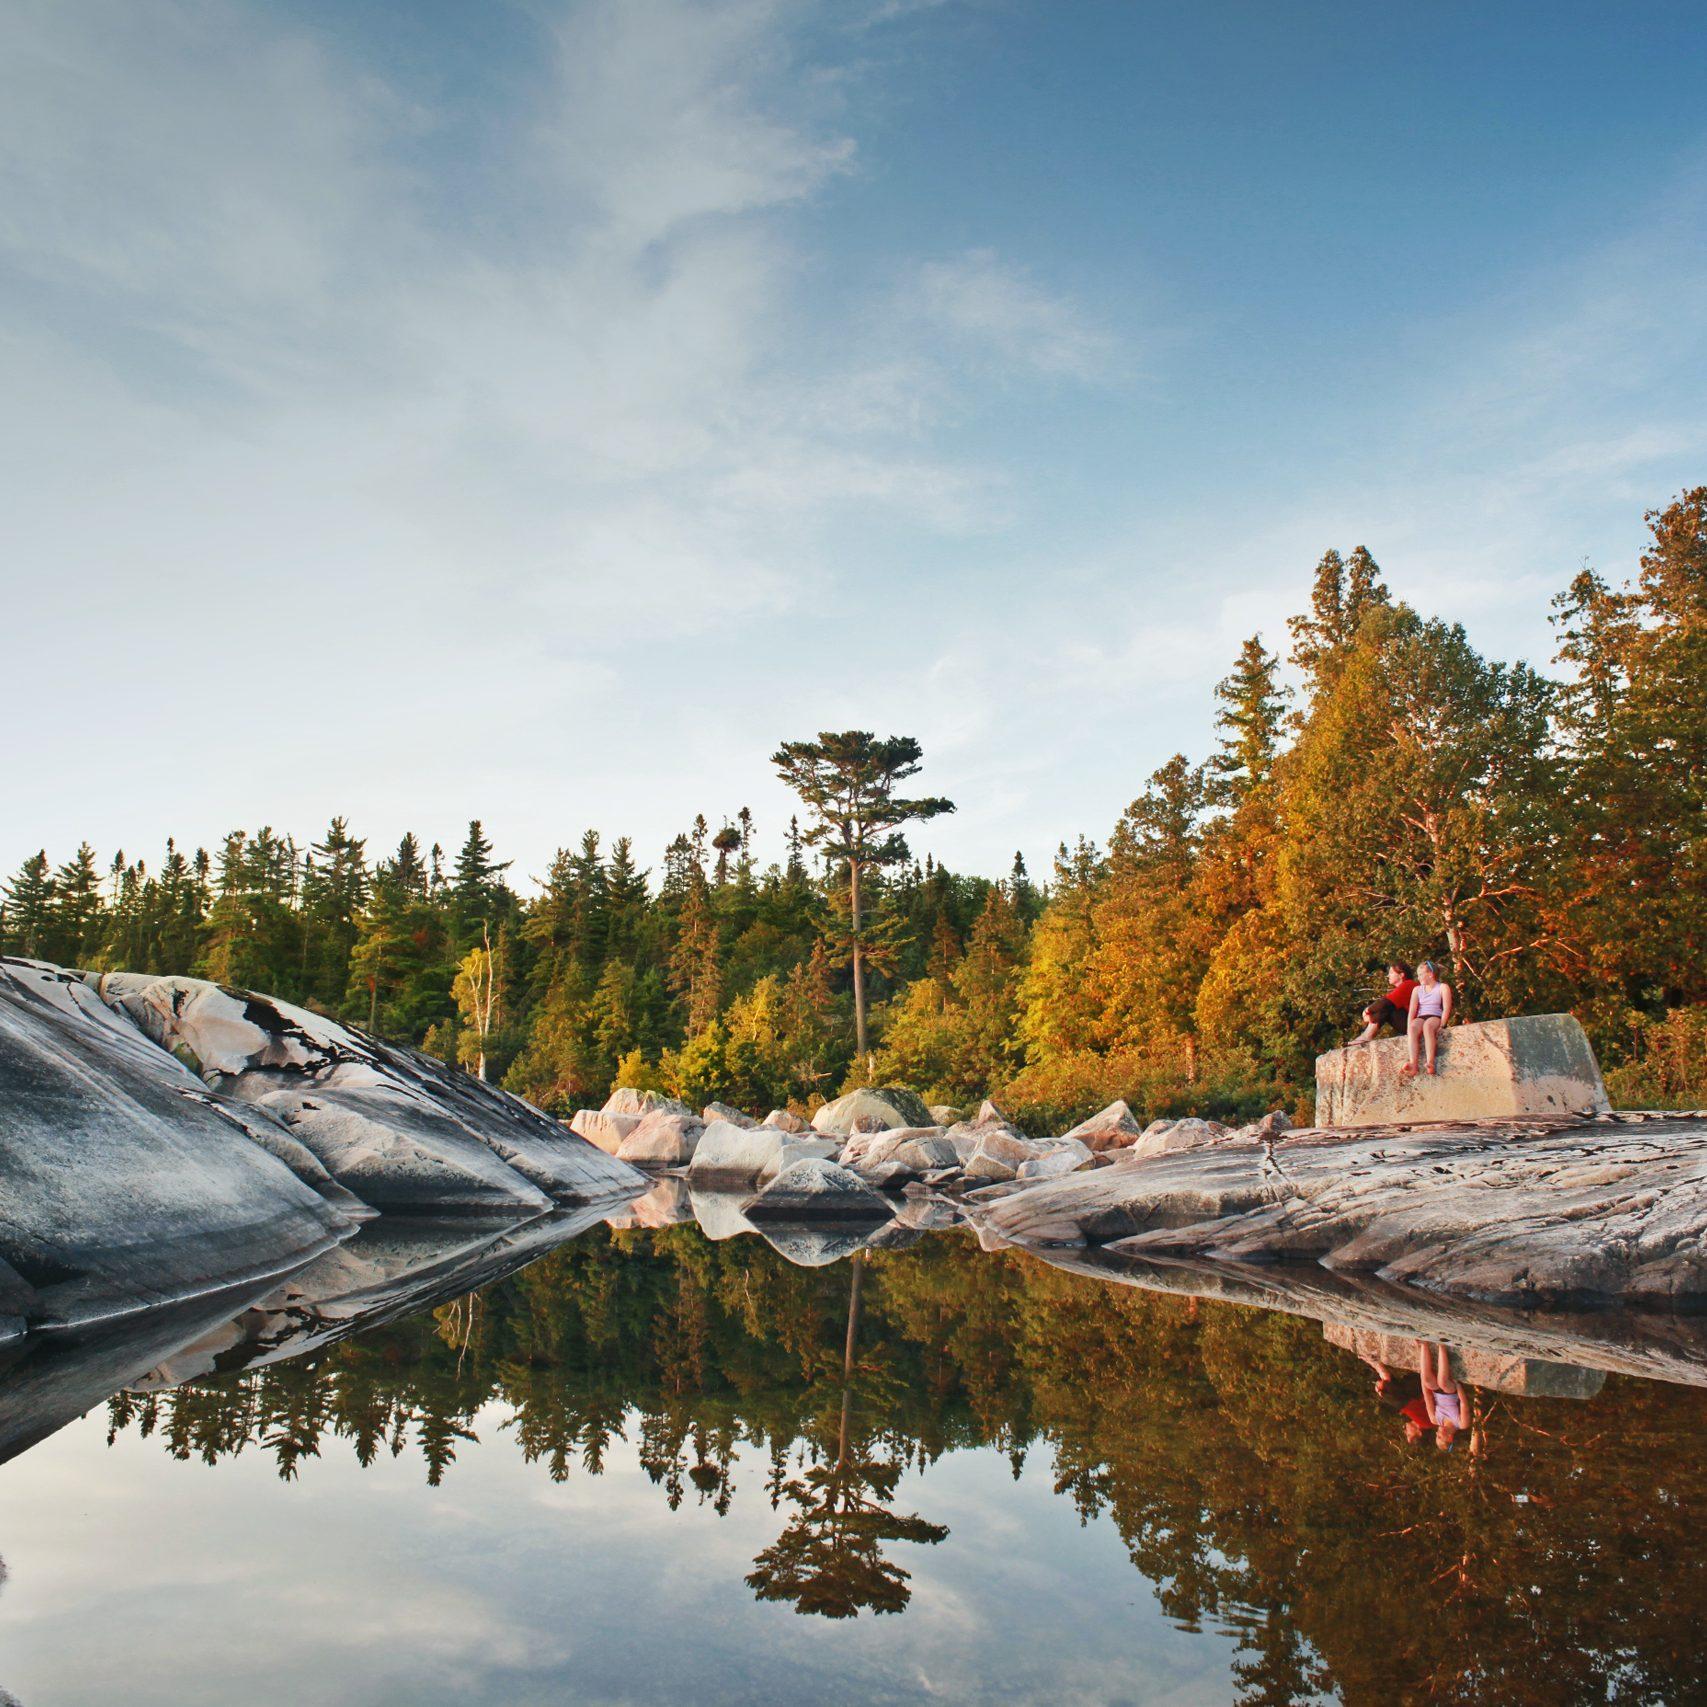 LakeSuperior_Shoreline_OntarioParks-Edit